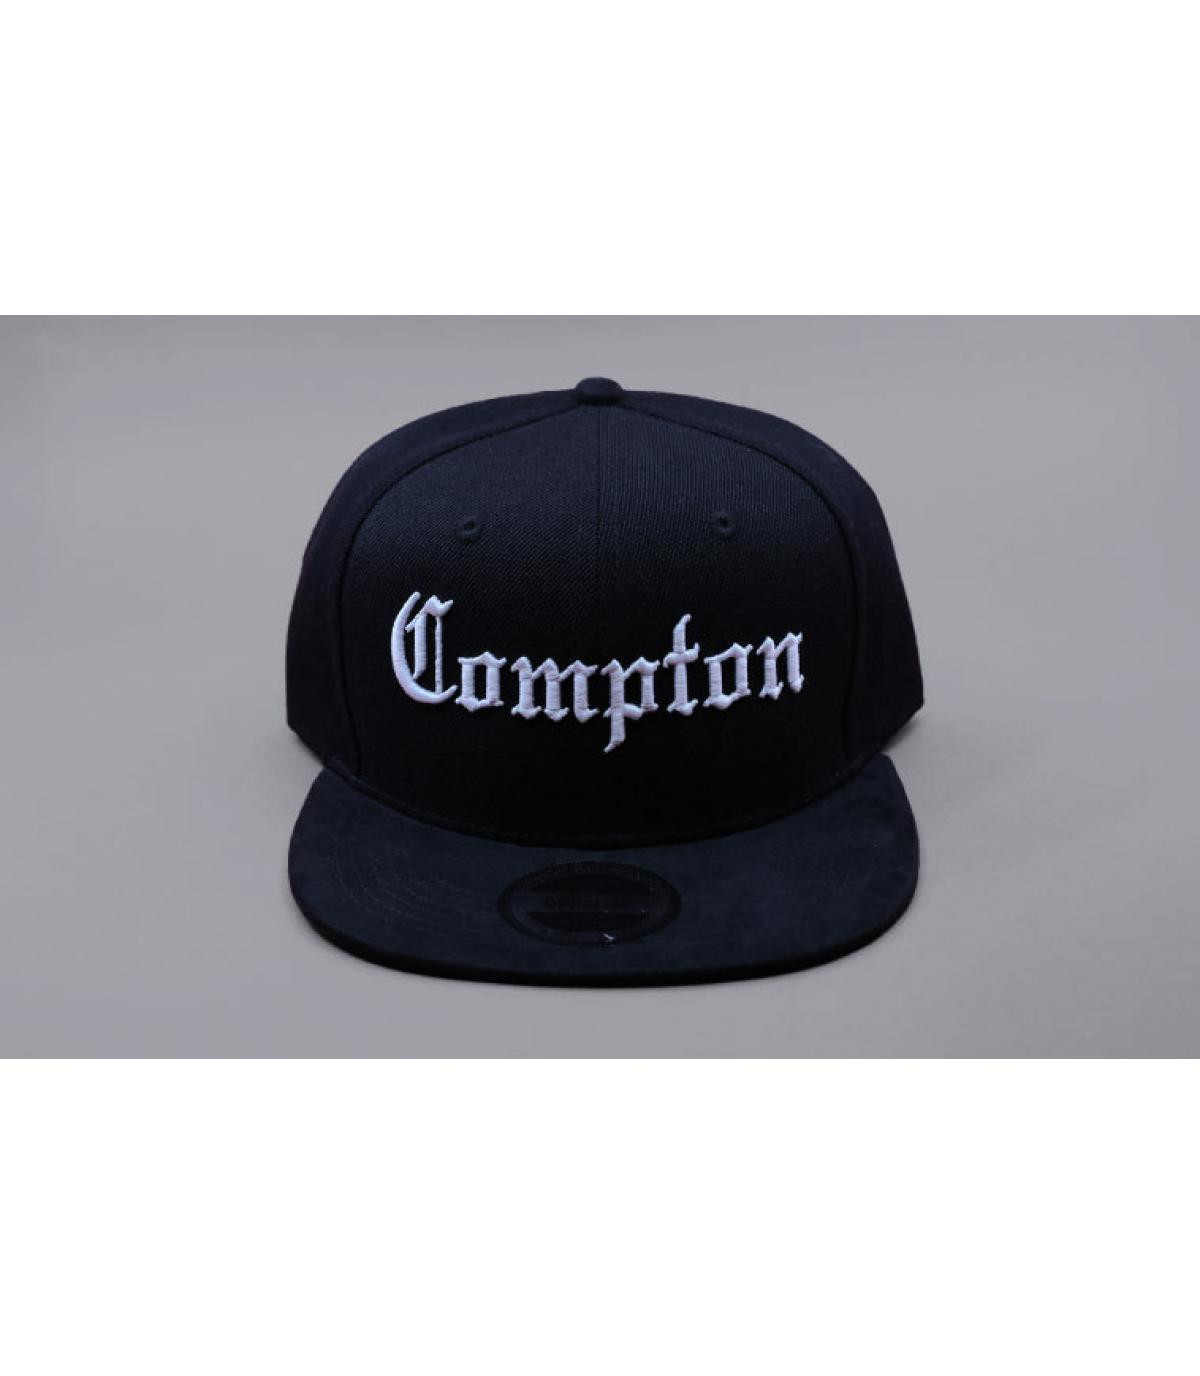 Details Compton Snapback - afbeeling 3